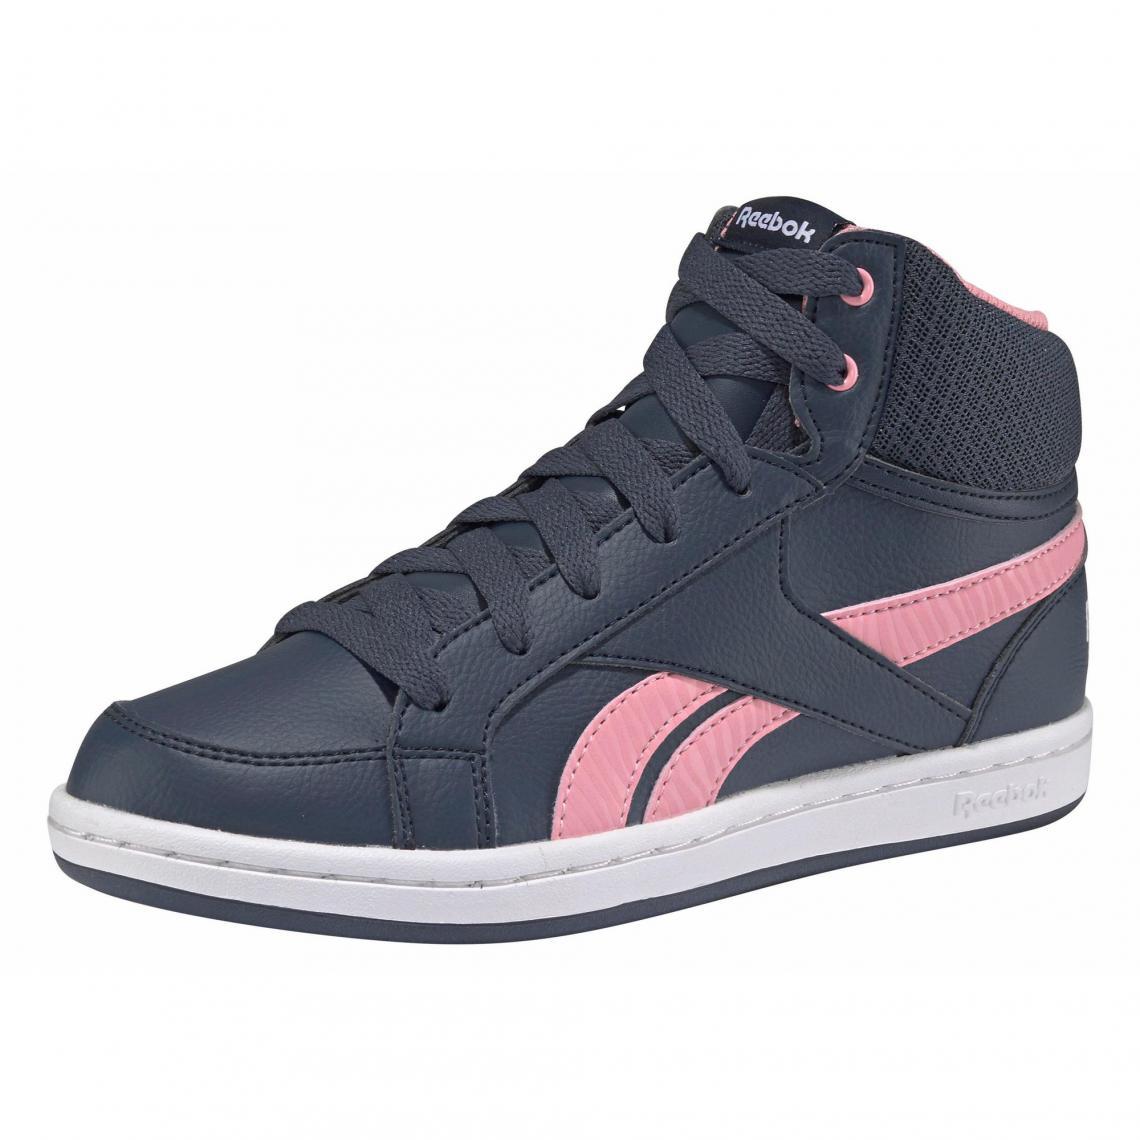 best cheap 966d5 19aad Baskets Reebok Royal Prime Mid sneakers fille Reebok Homme